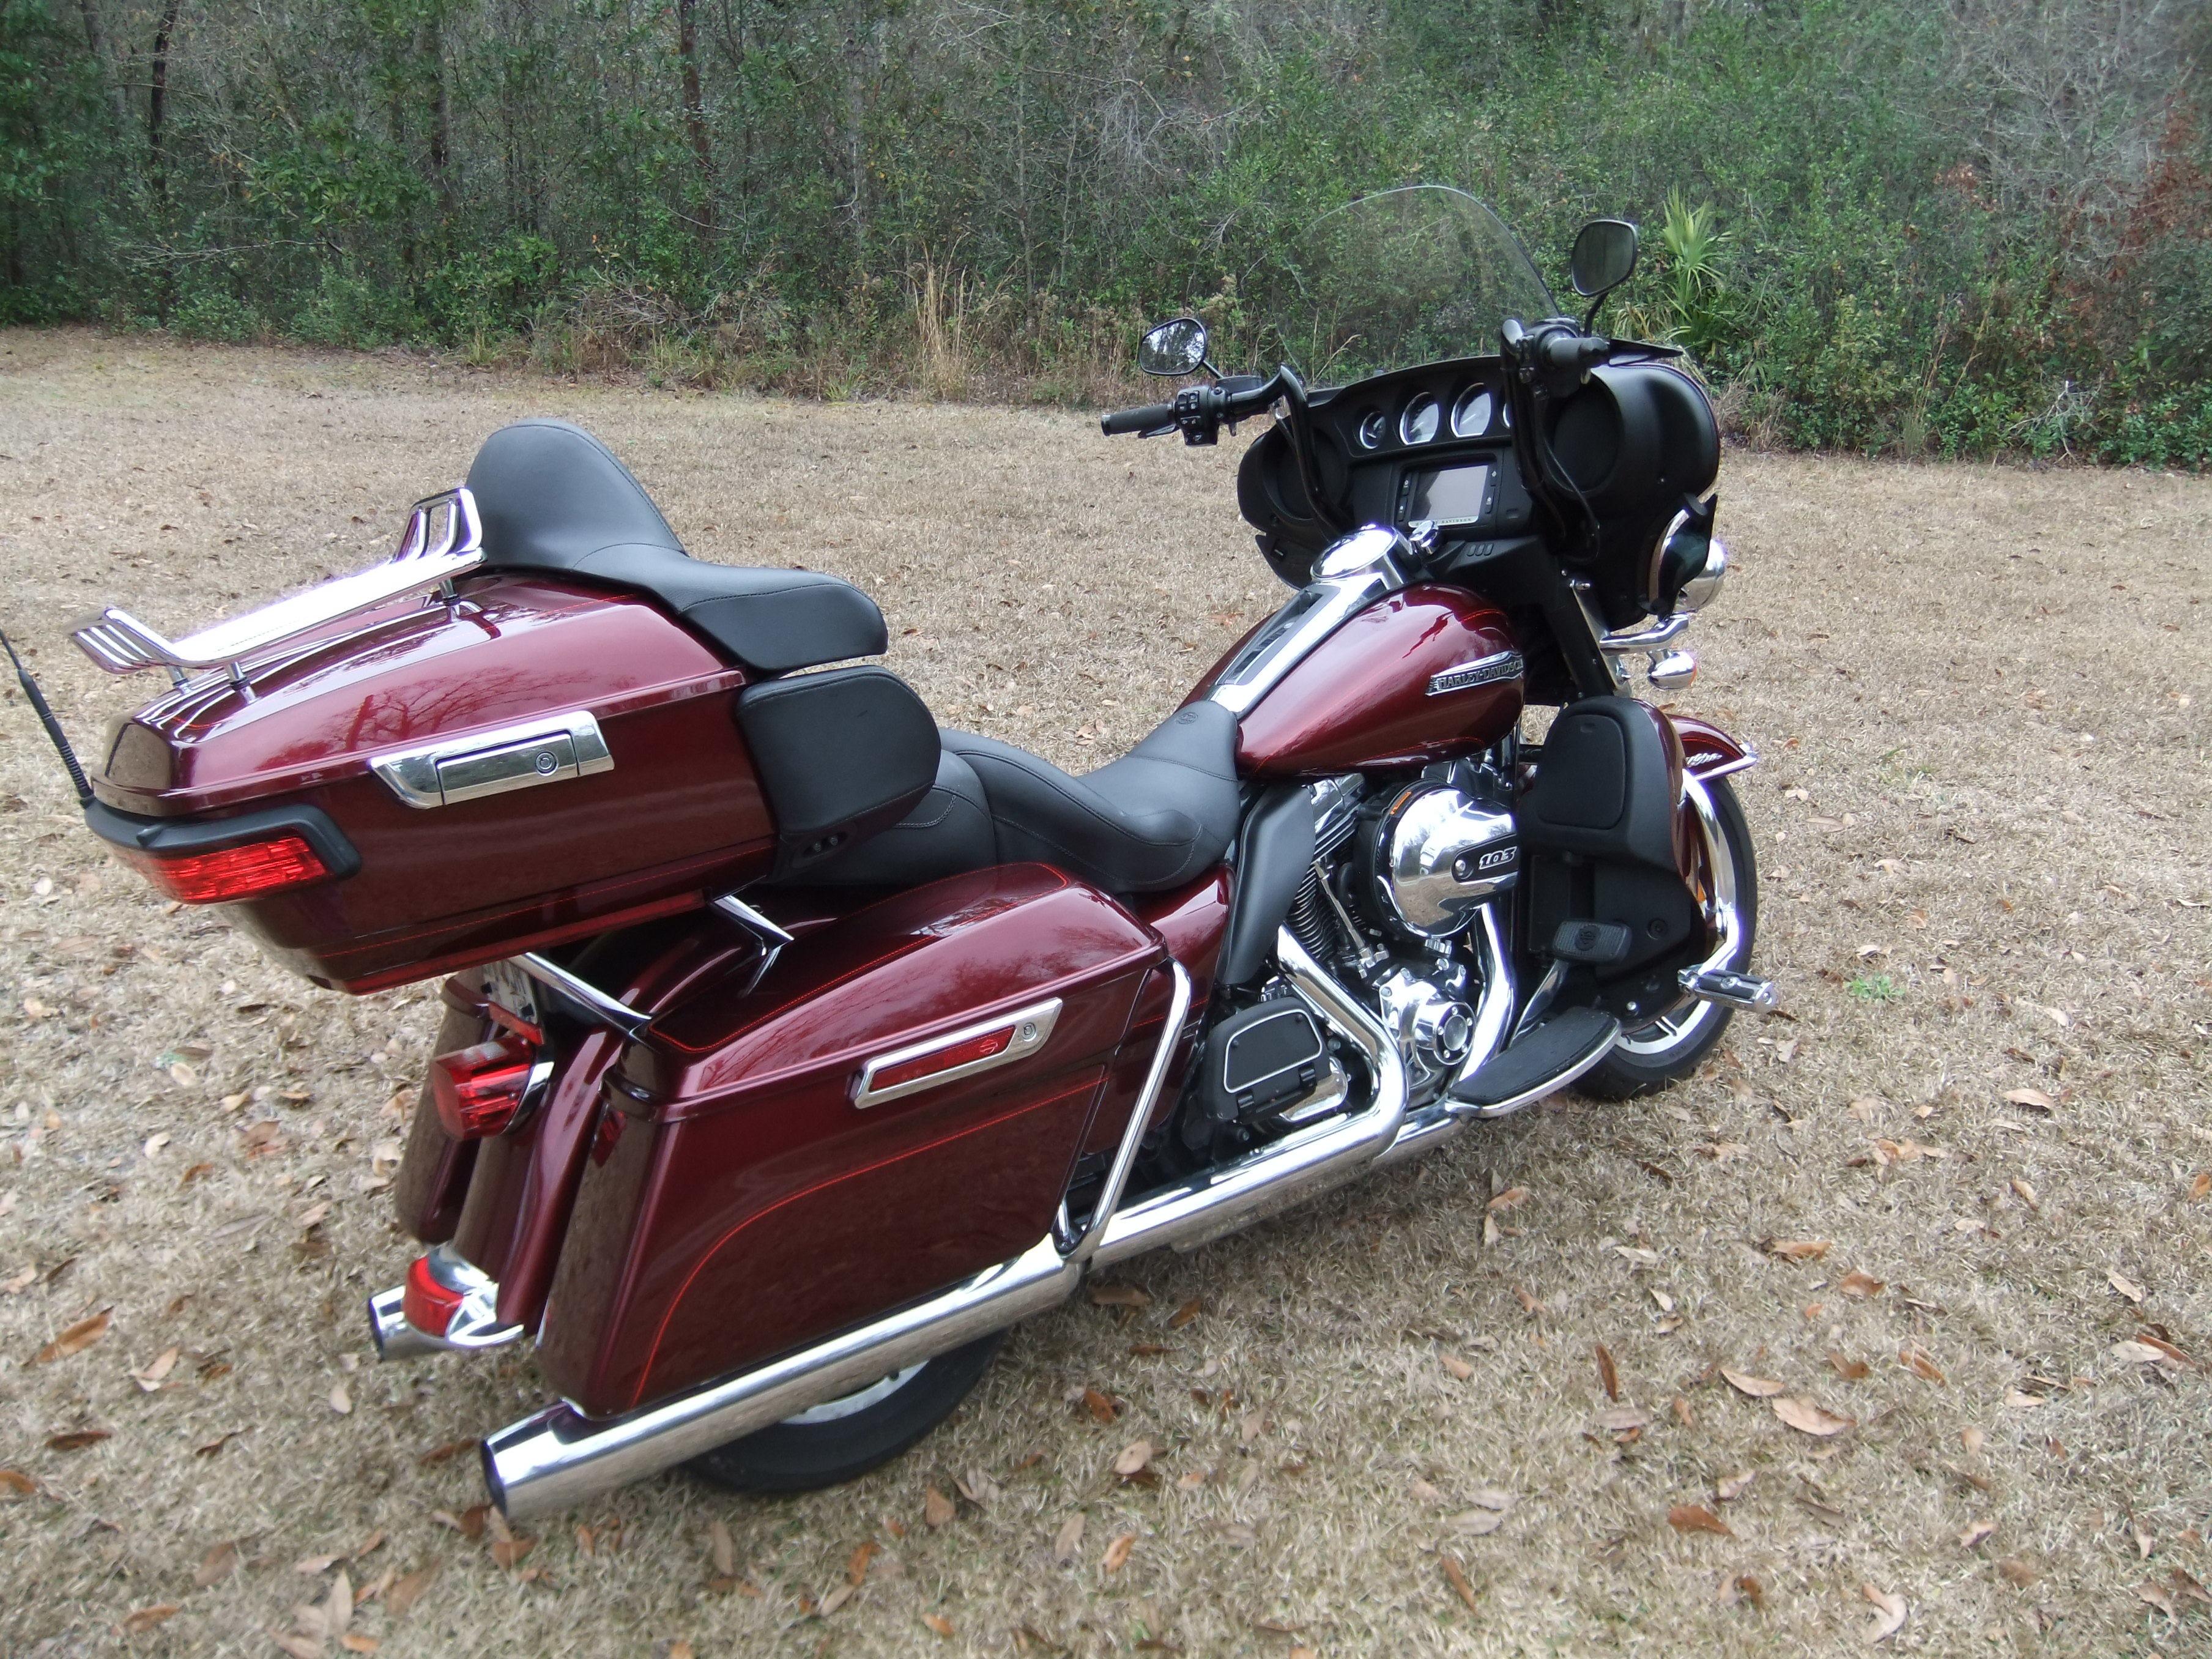 Photo 2015 Harley-Davidson ELECTRA GLIDE ULTRA CLASSIC $277.50277.50